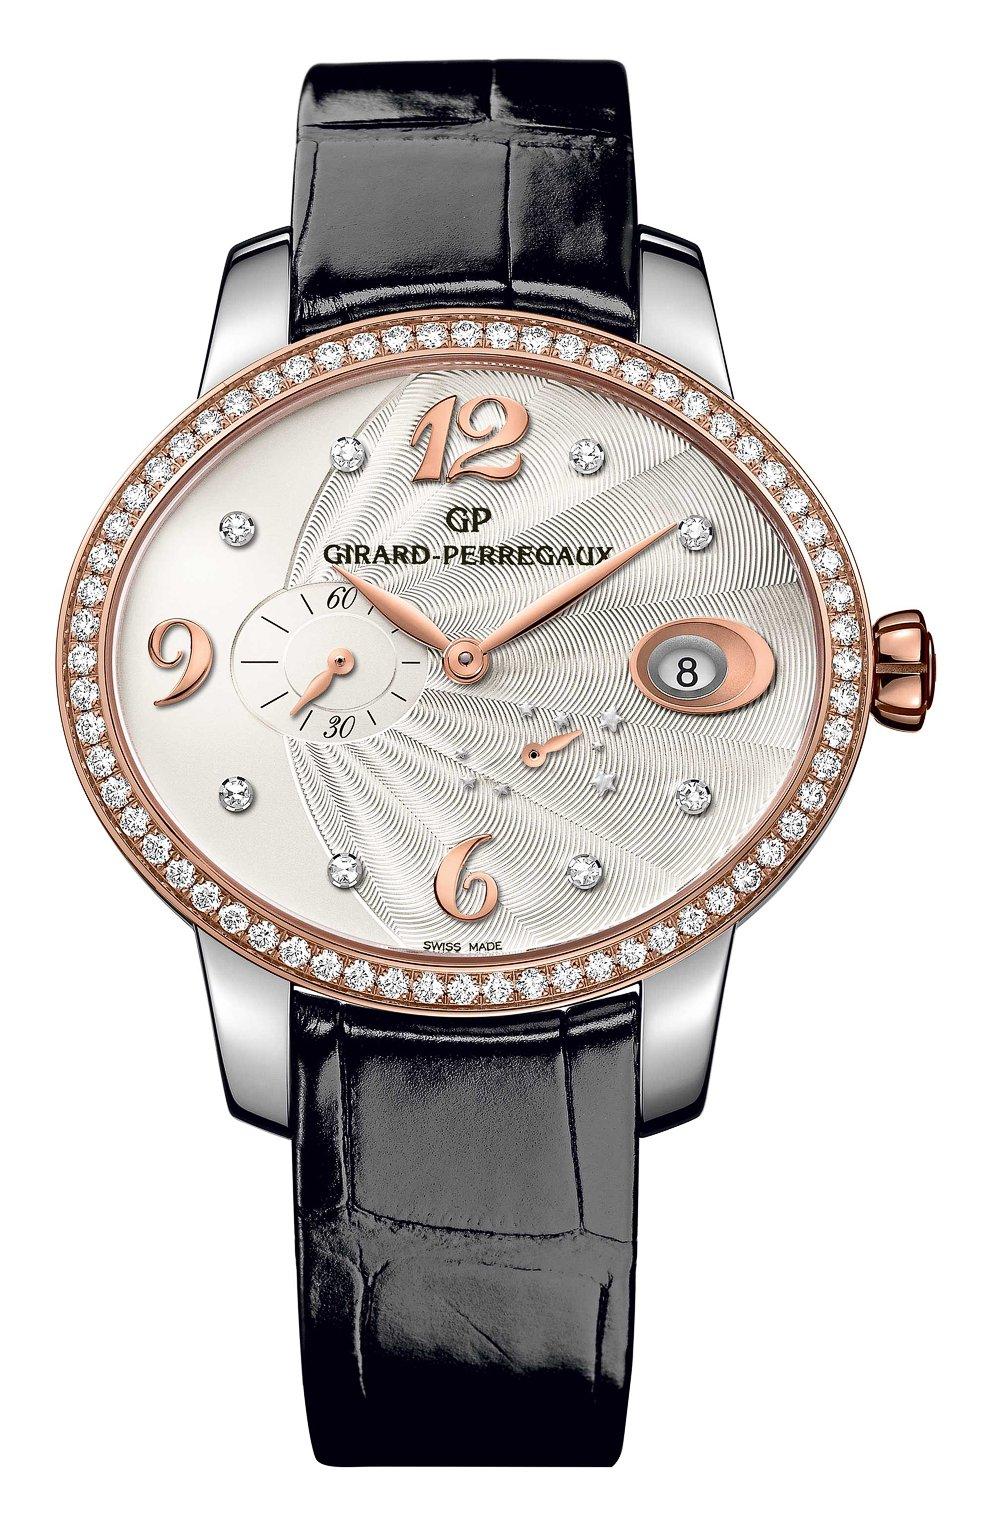 Женские часы power reserve steel and rose gold GIRARD-PERREGAUX серебряного цвета, арт. 80486D56A162-CK6A   Фото 1